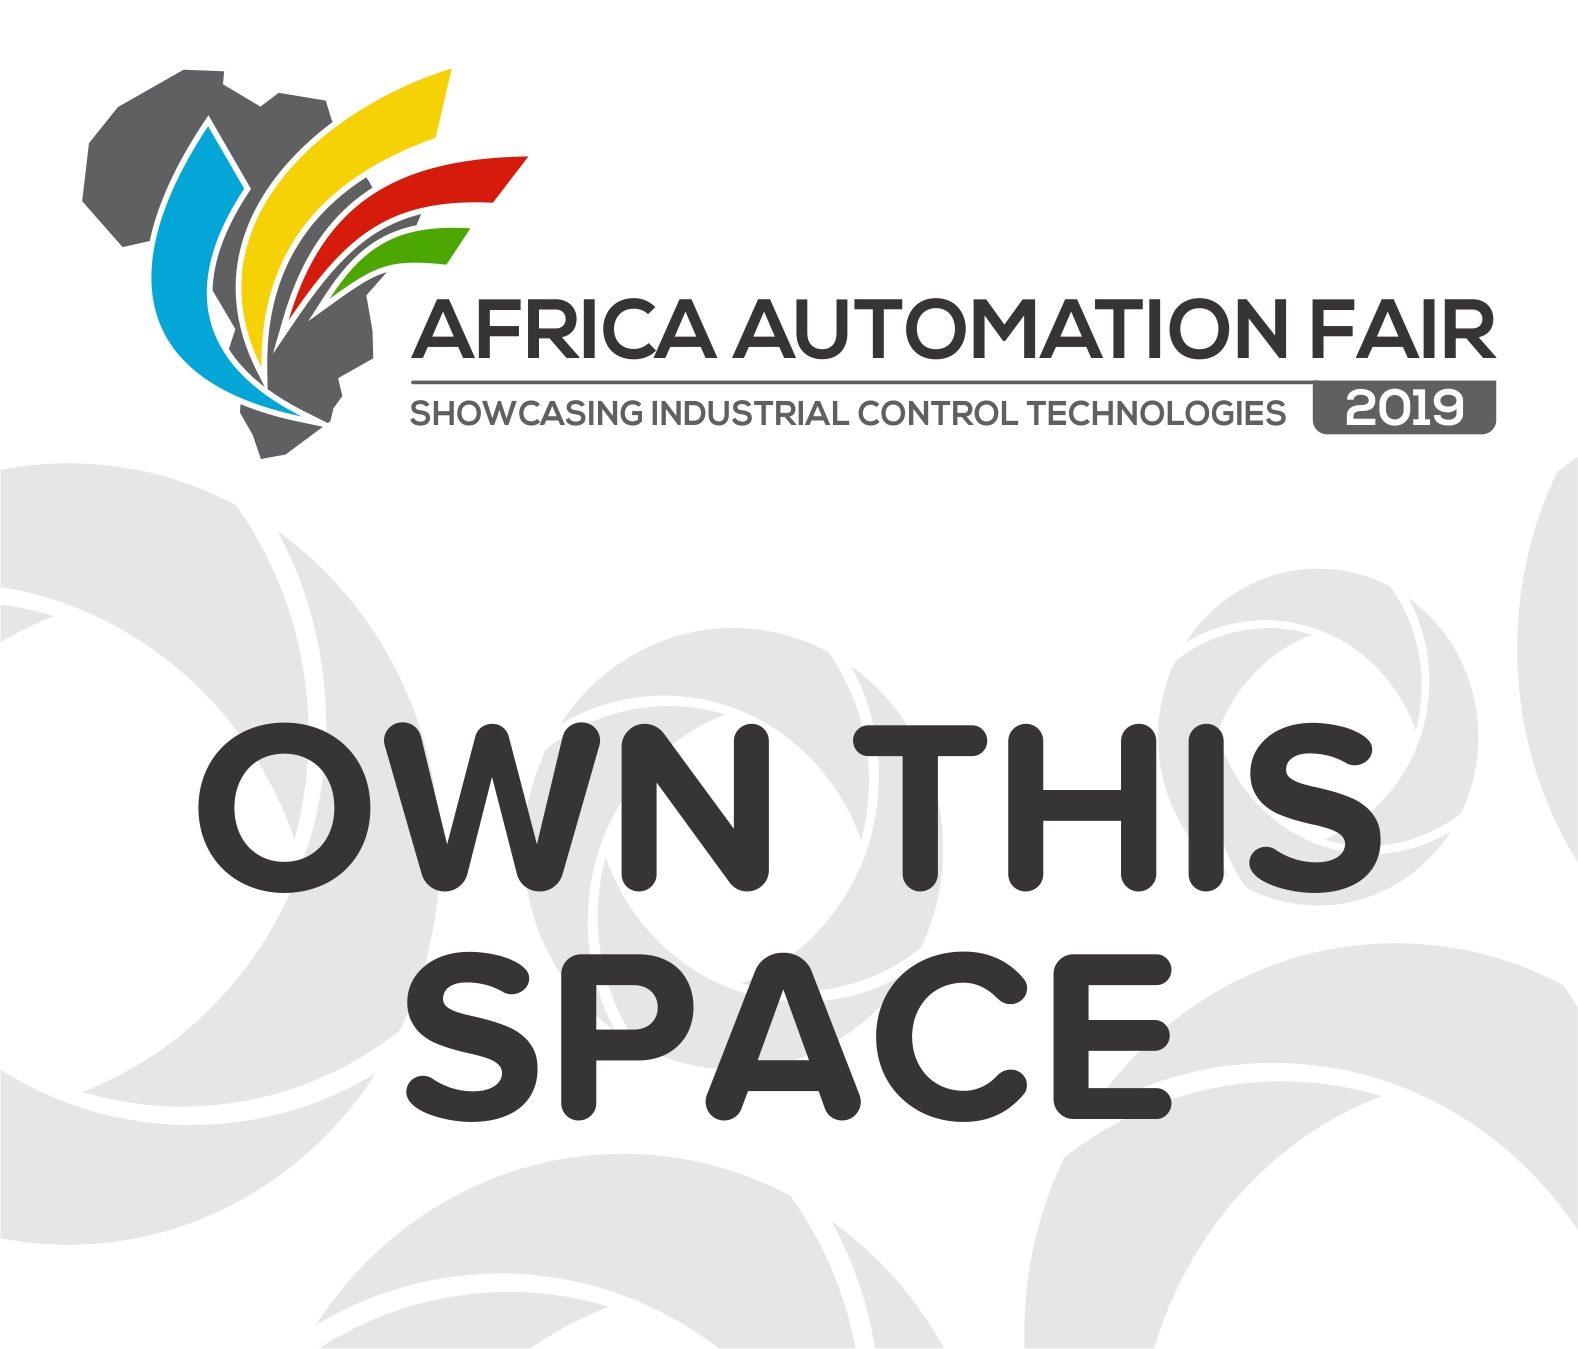 africa automation fair rh africaautomationfair com New Home Congratulations Clip Art Welcome Home Sign